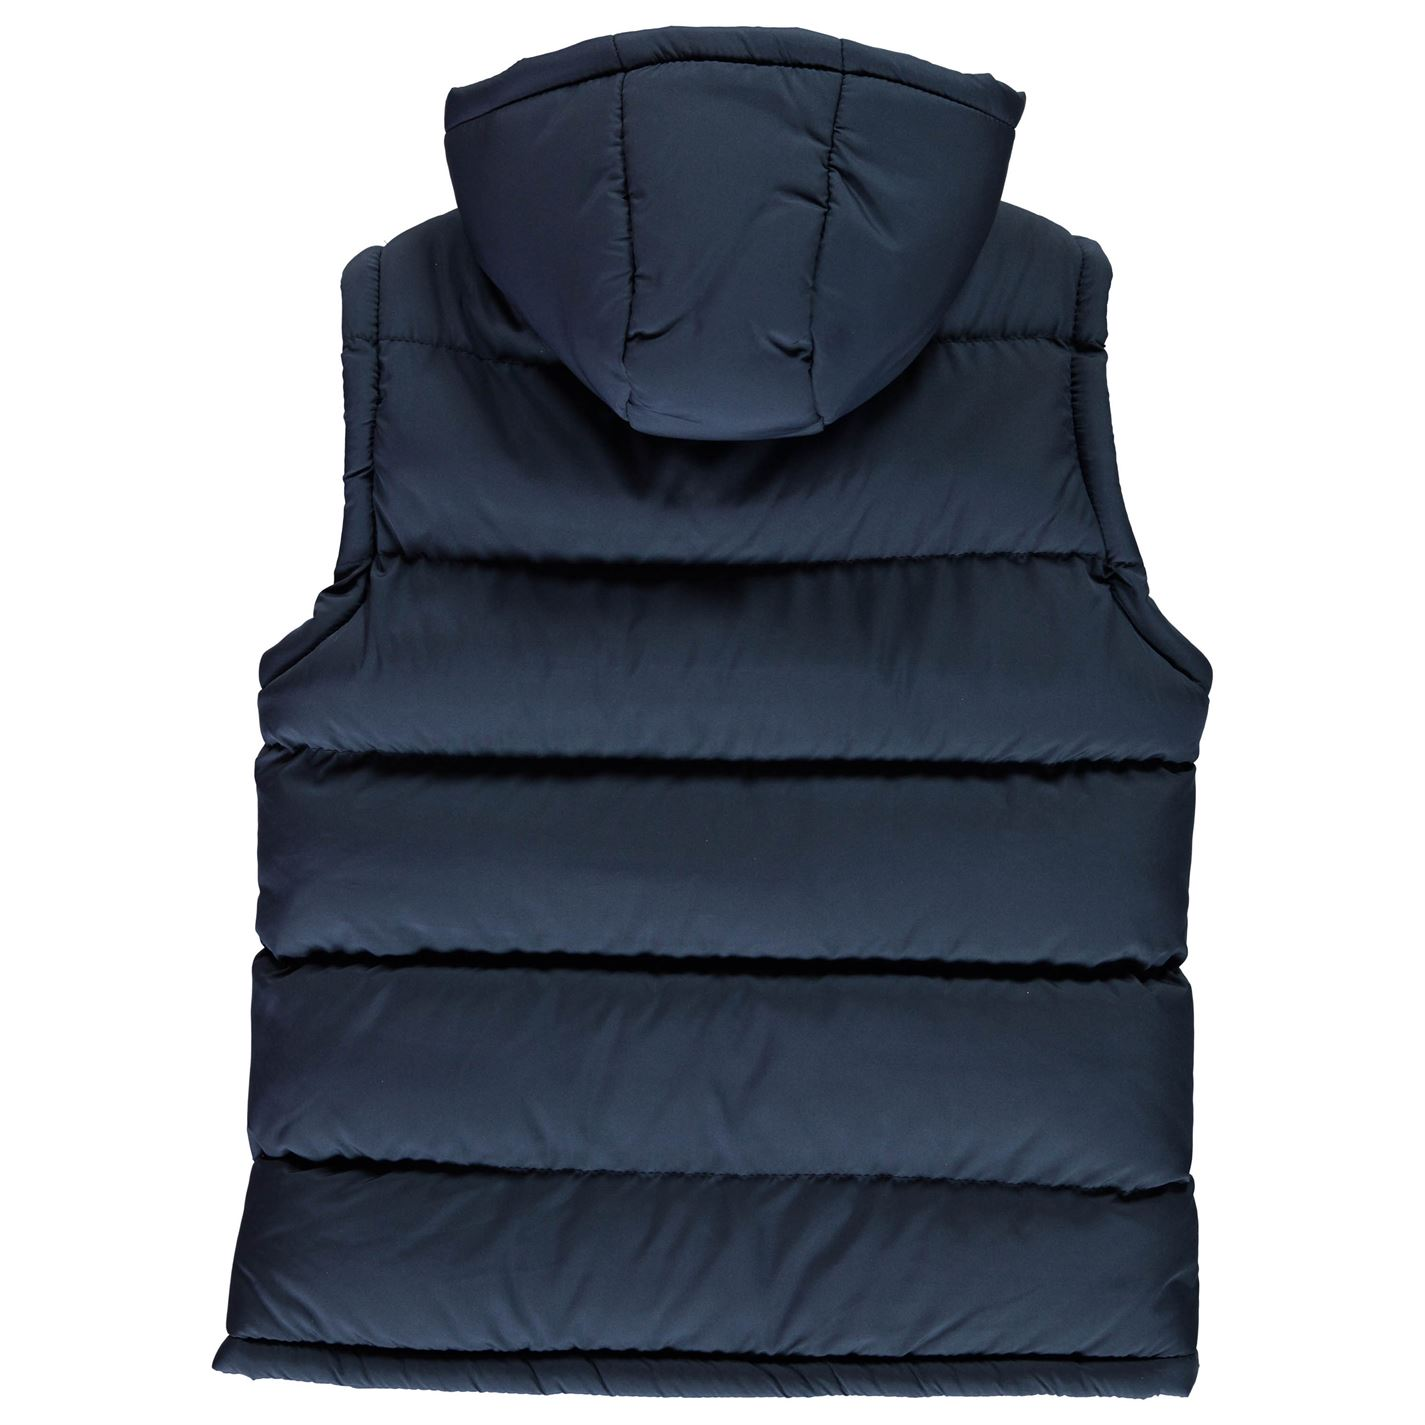 Lee Cooper Kids Boys 2 Zip Gilet Junior Sleeveless Jacket Hooded Full Print